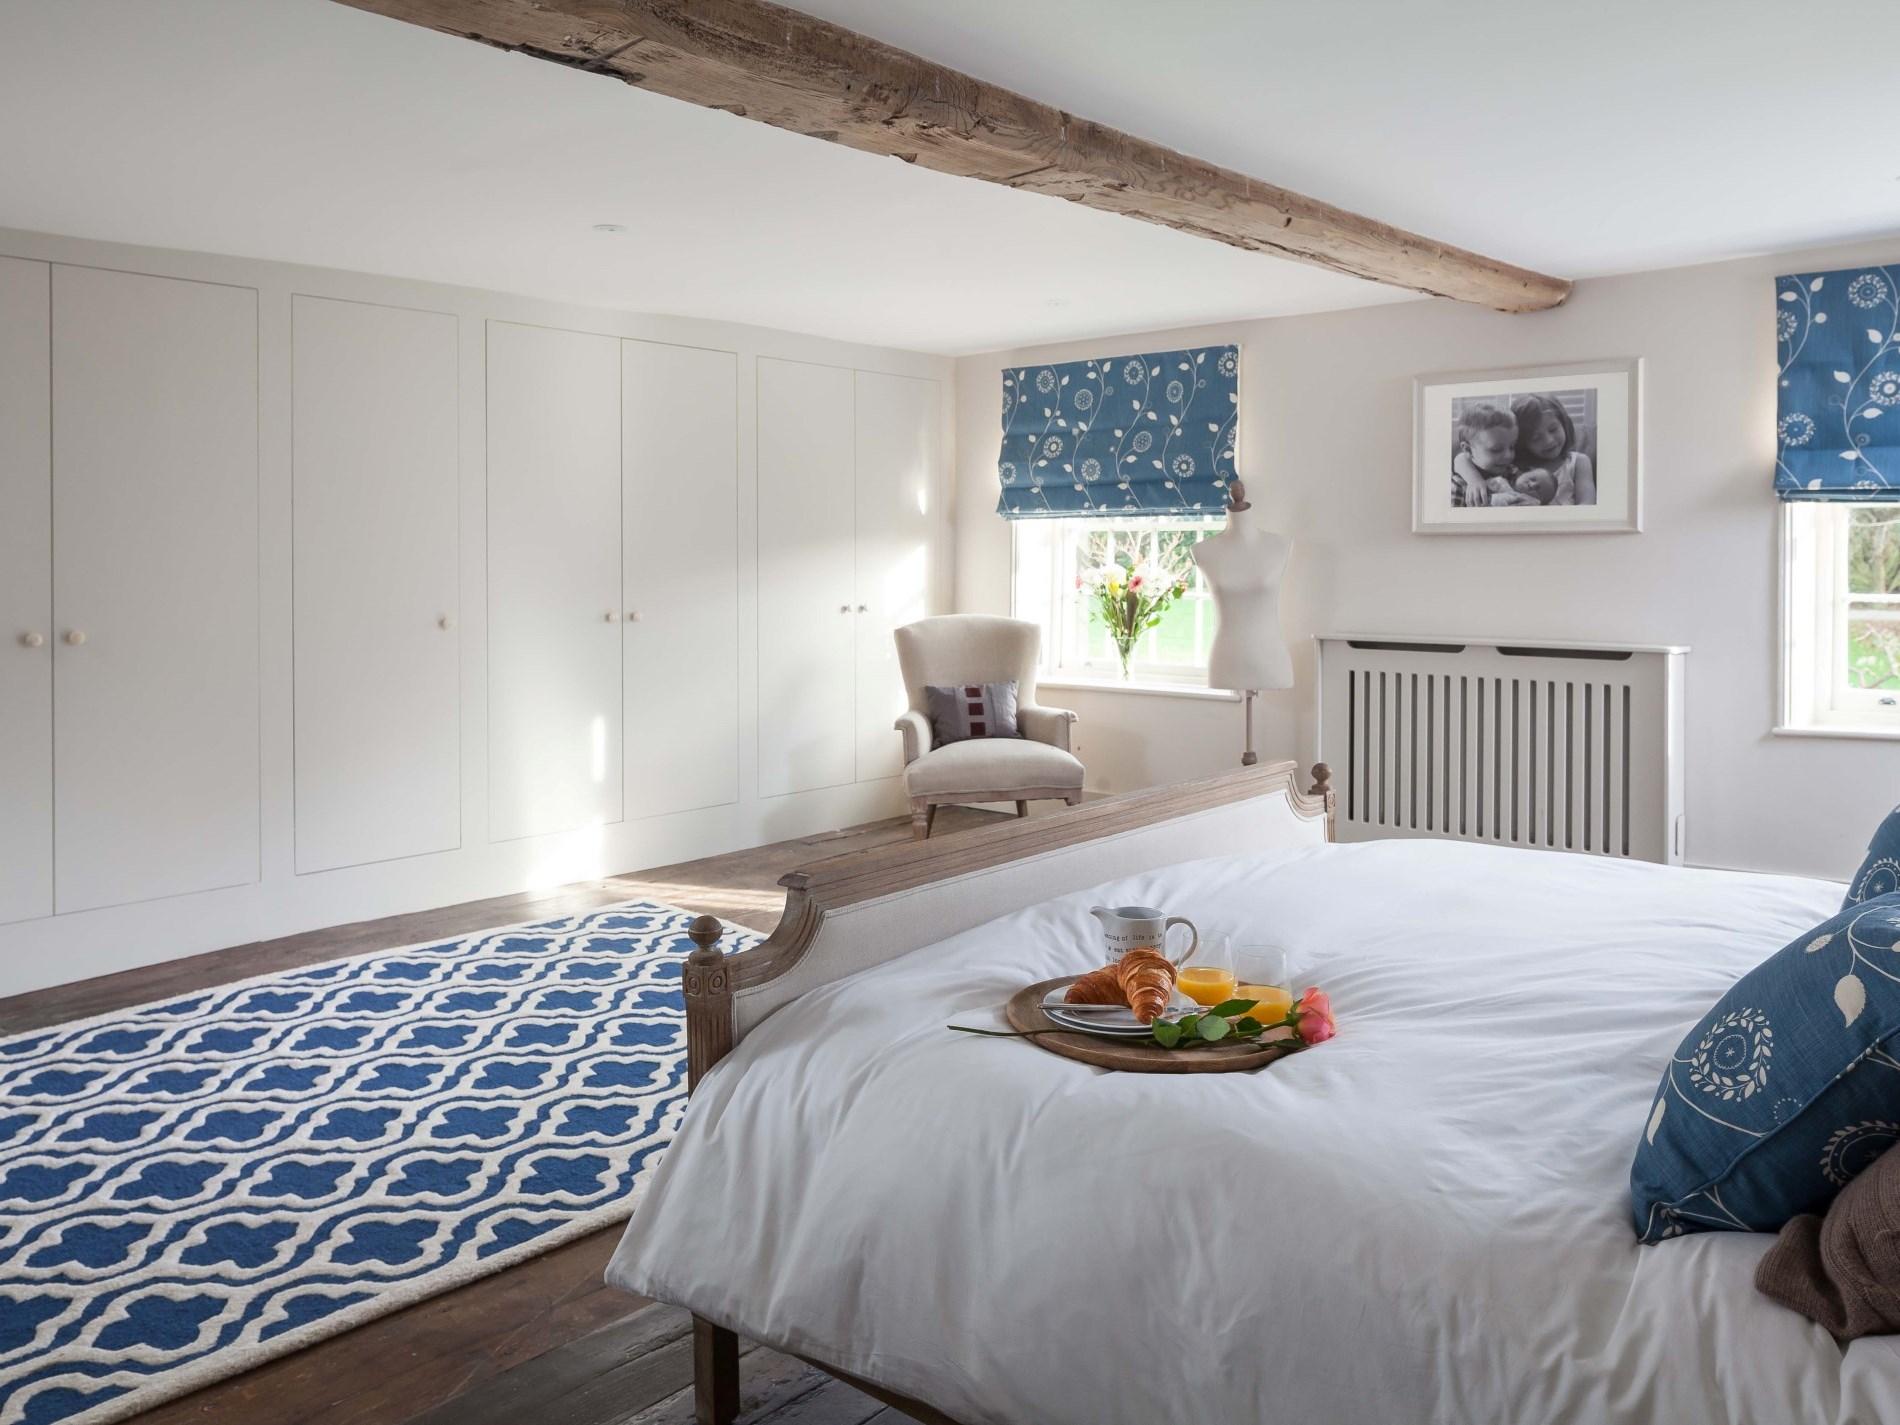 Elegantly styled bedrooms